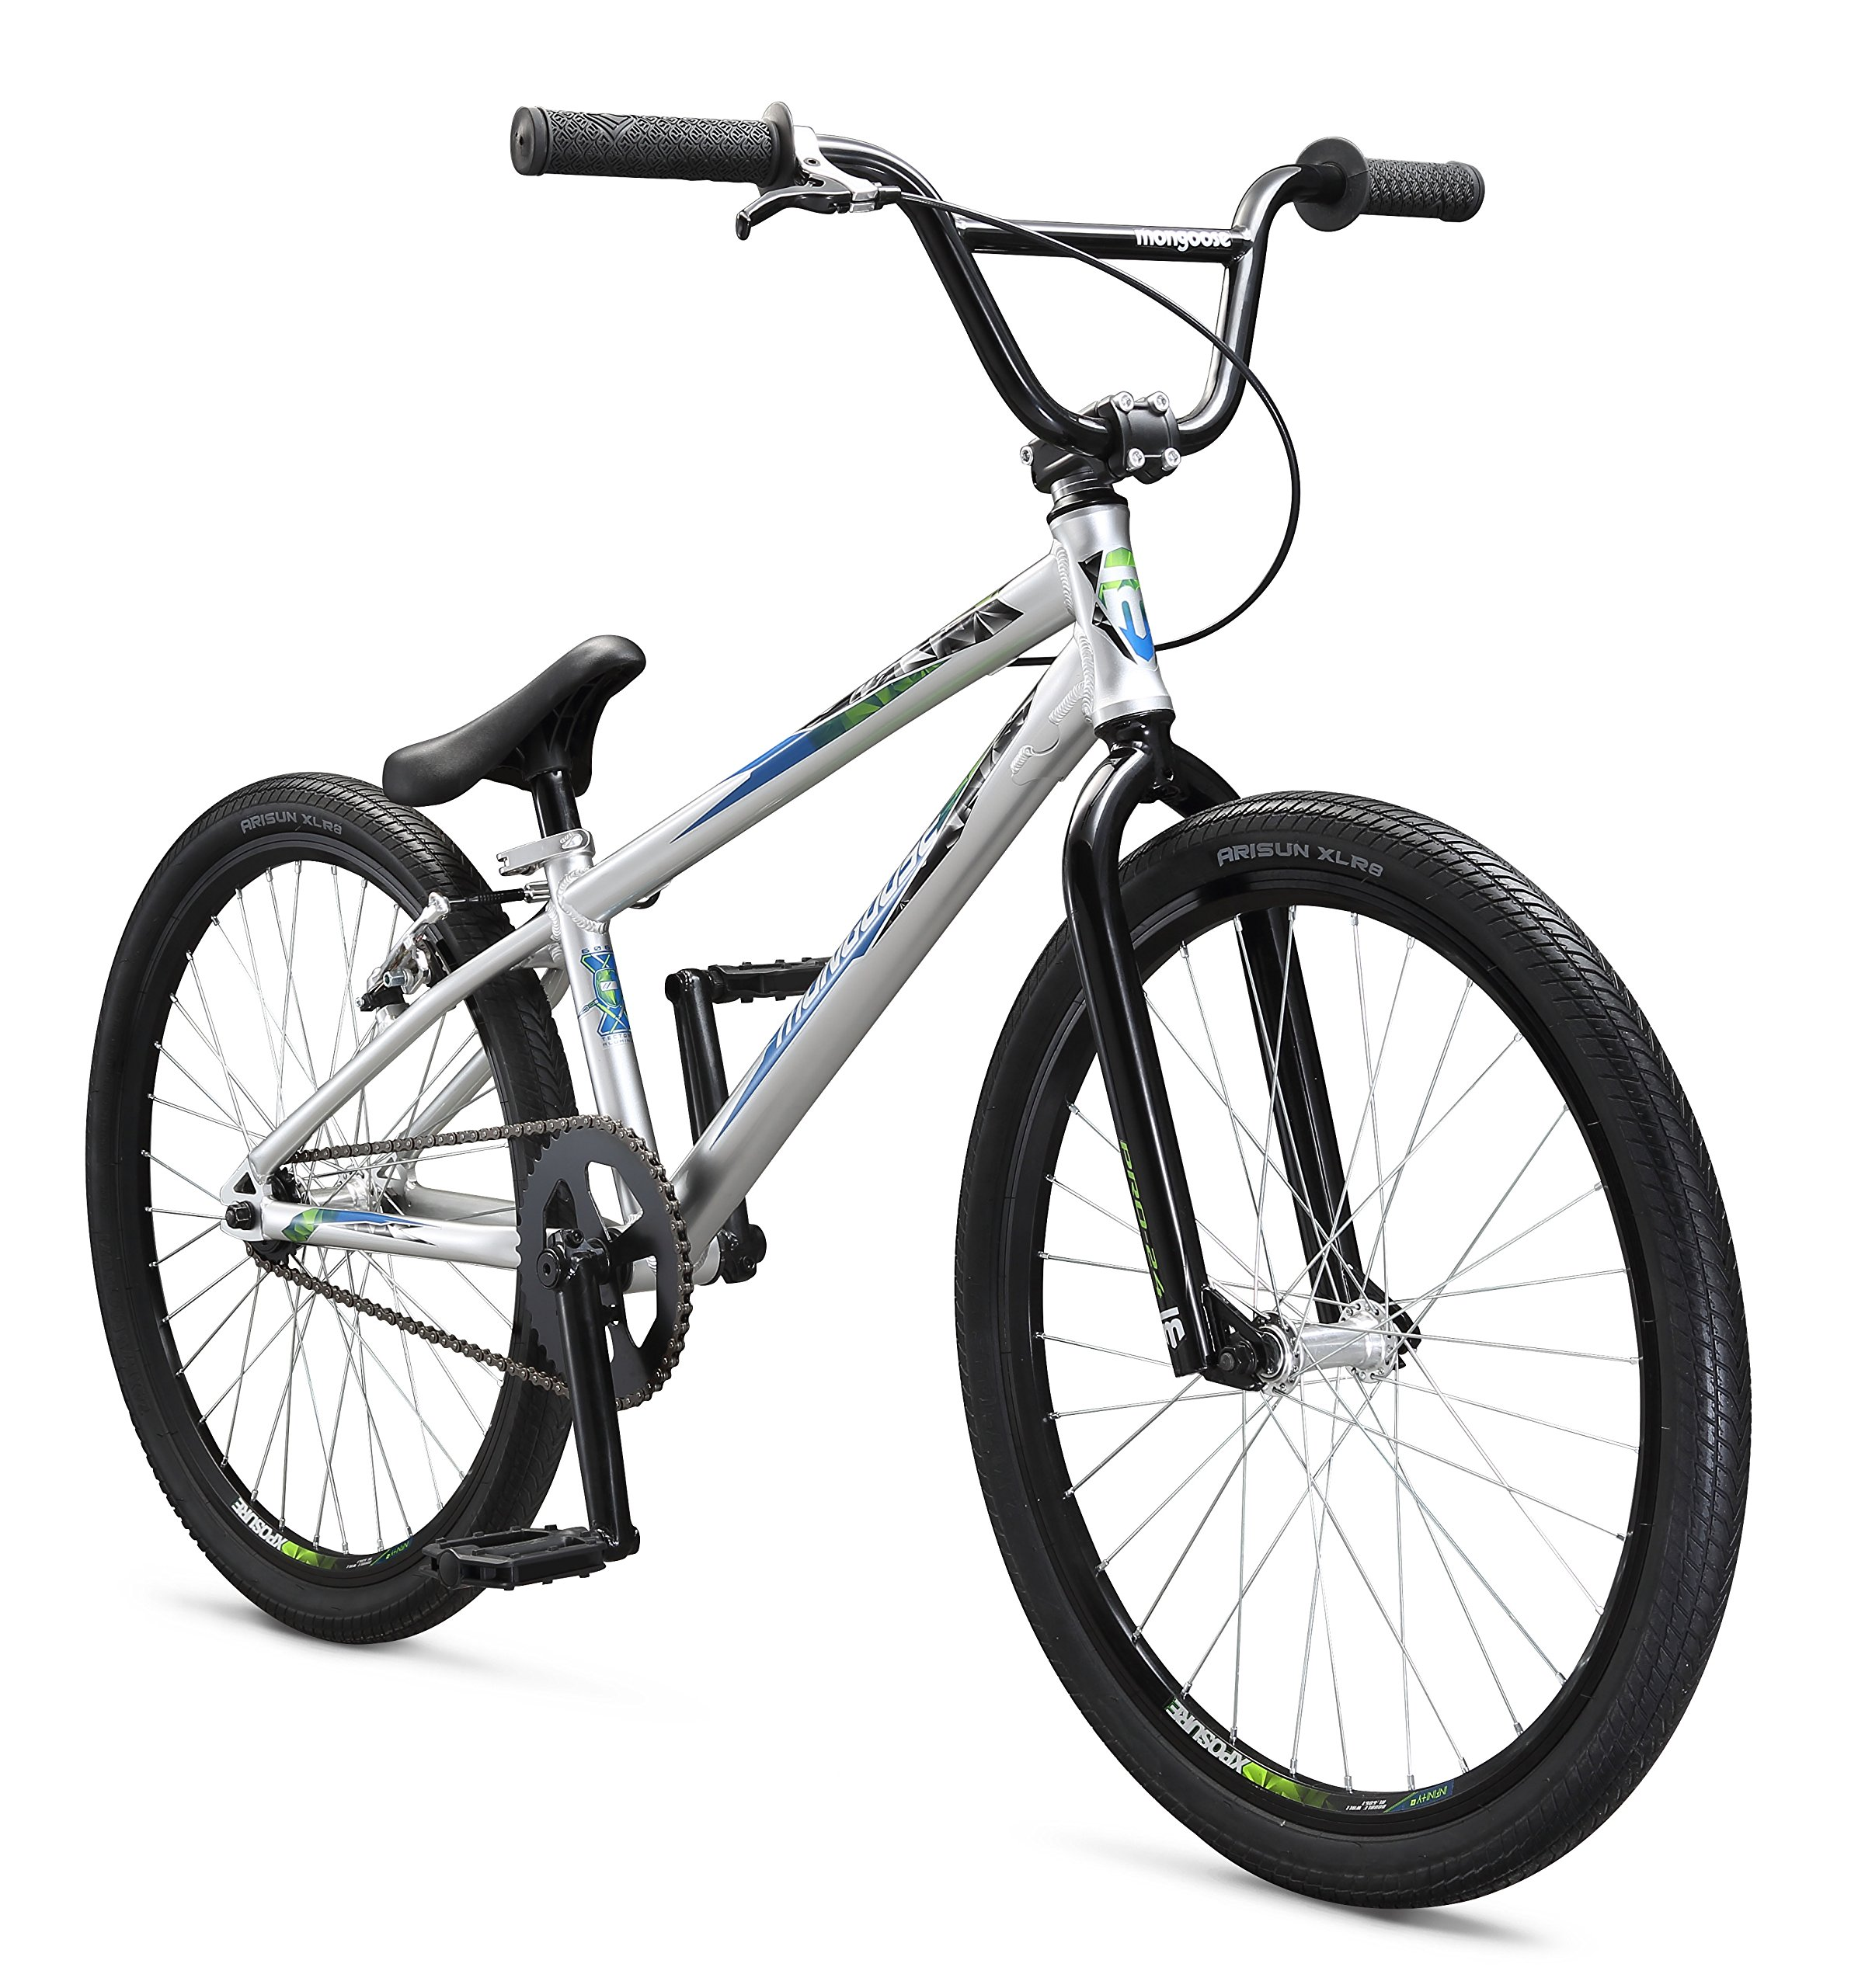 49fe5755519 Mongoose Title 24 BMX Race Bikes, 24-Inch Wheels, Multiple Colors product  image